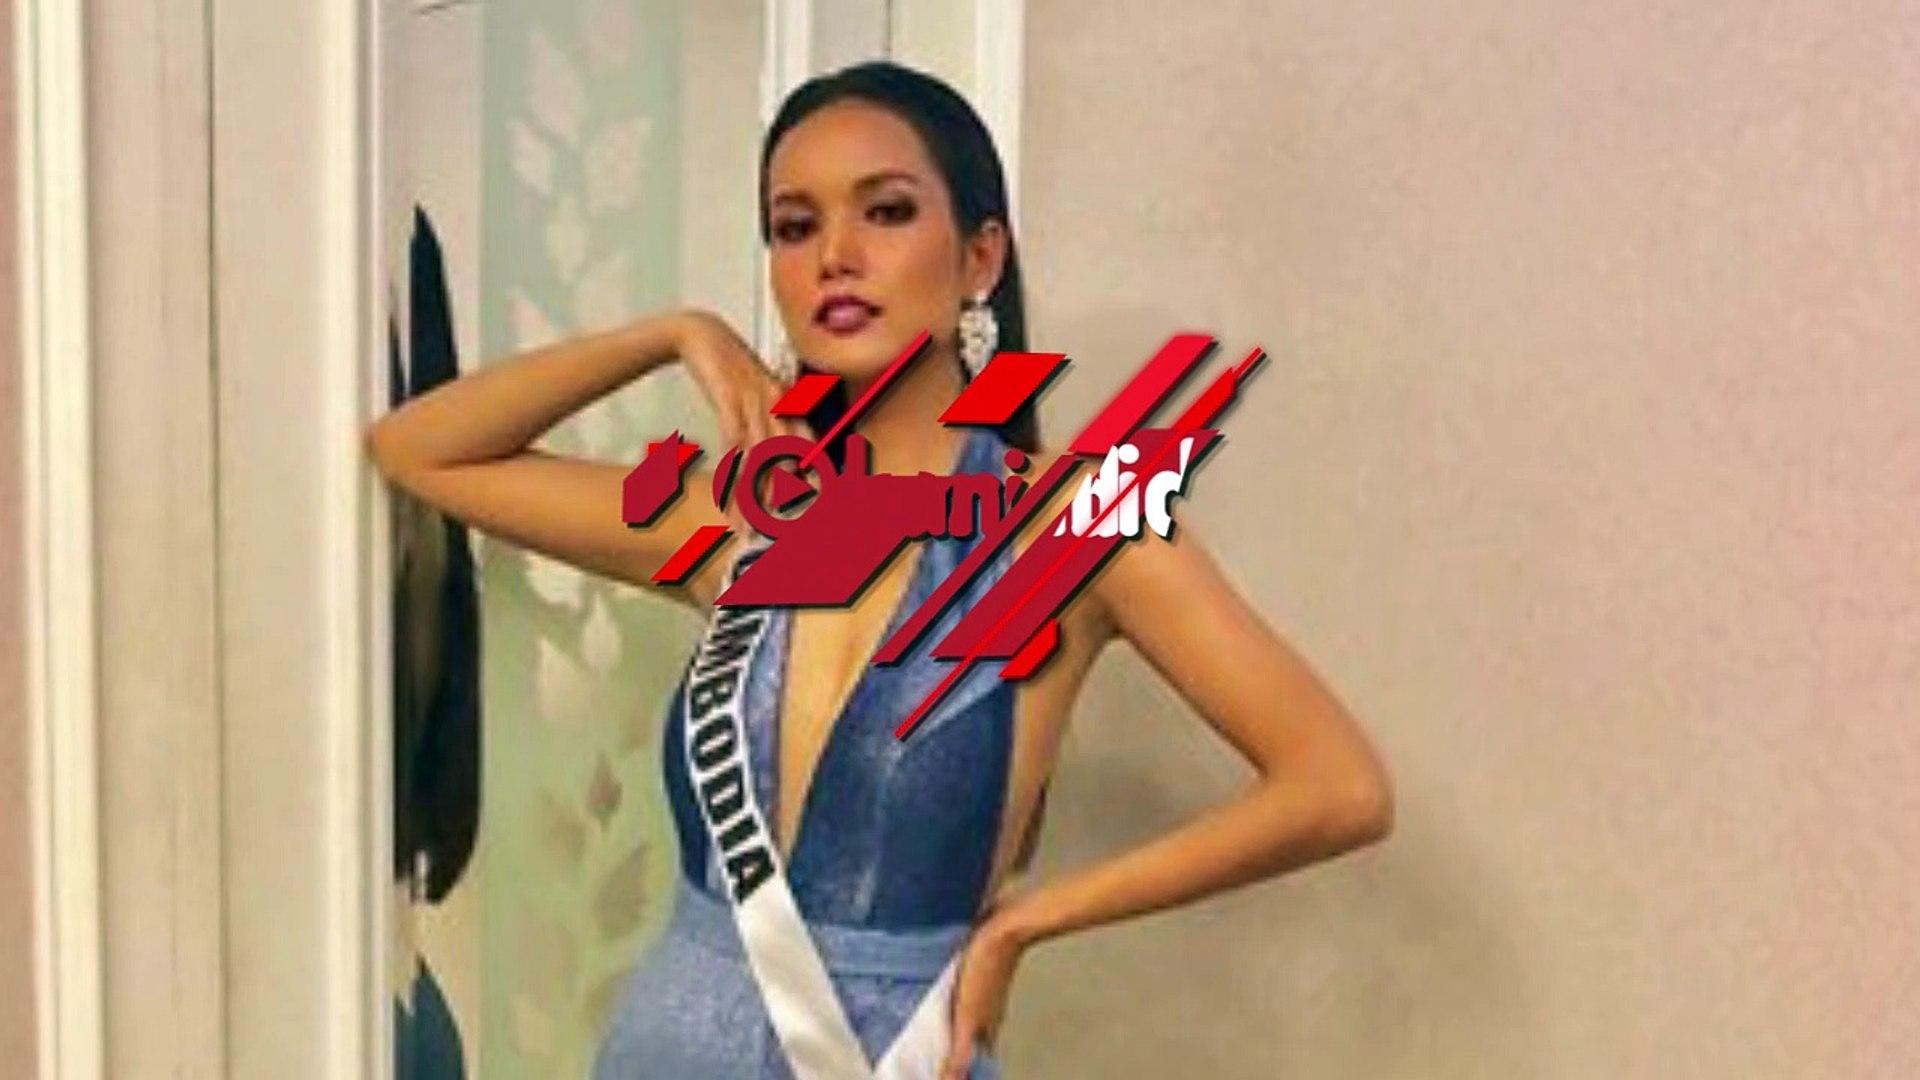 Finalis Miss Universe 2018 Sempat Menangis Karena Tidak Bisa Bahasa Inggris